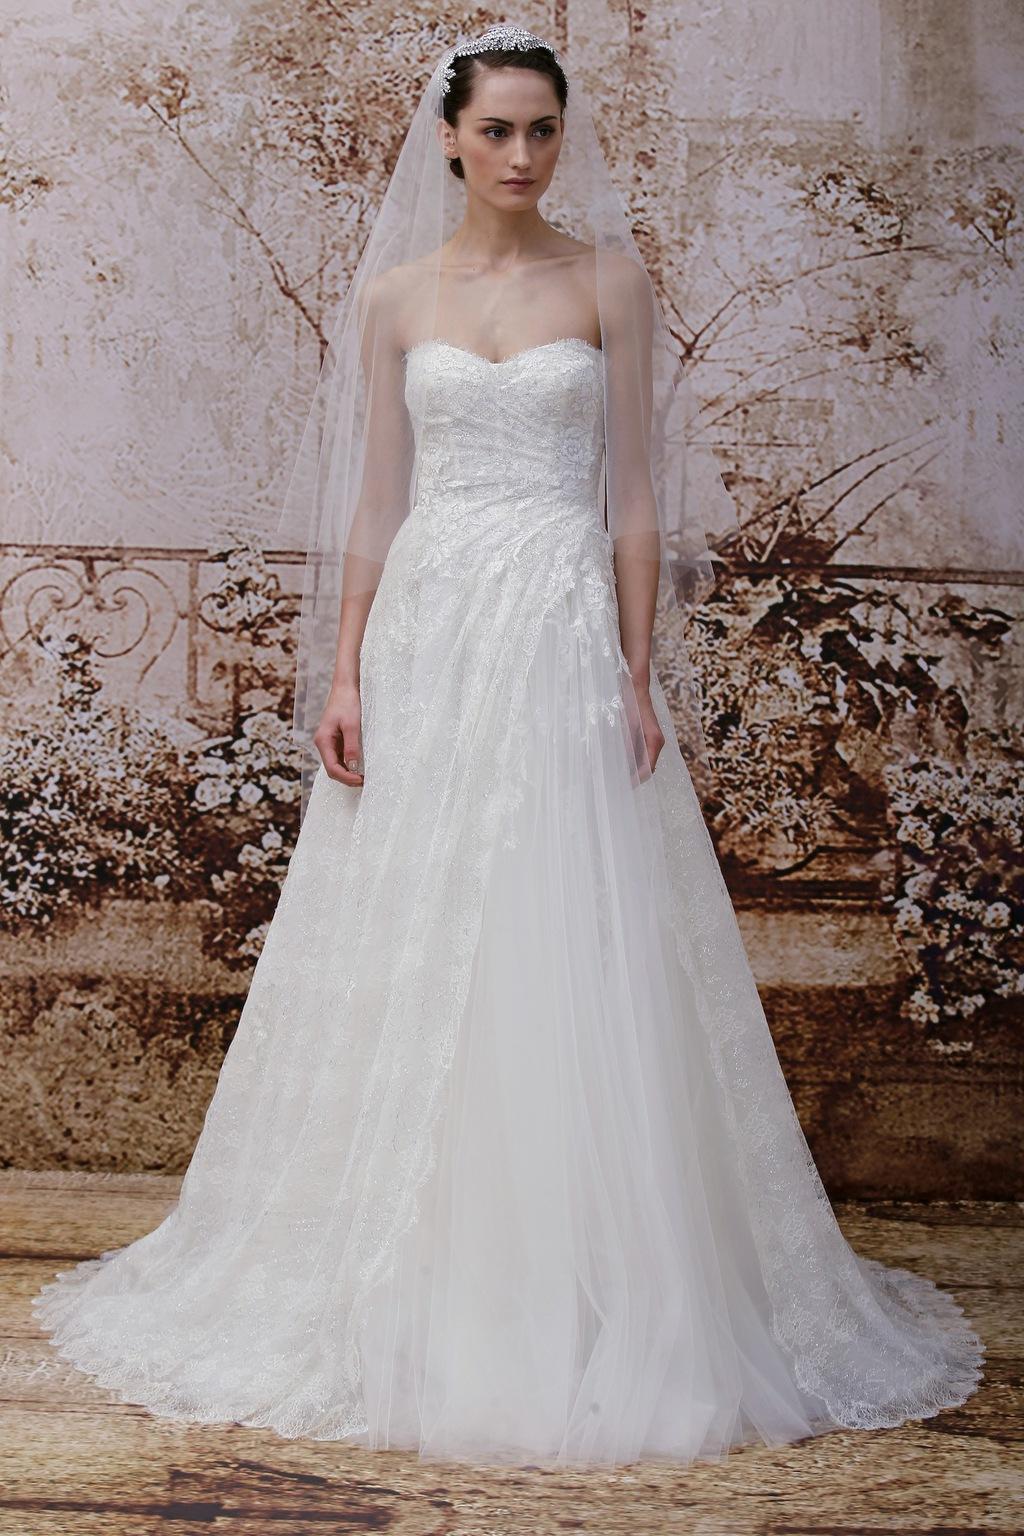 Wedding-dress-by-monique-lhuillier-fall-2014-bridal-look-22.full